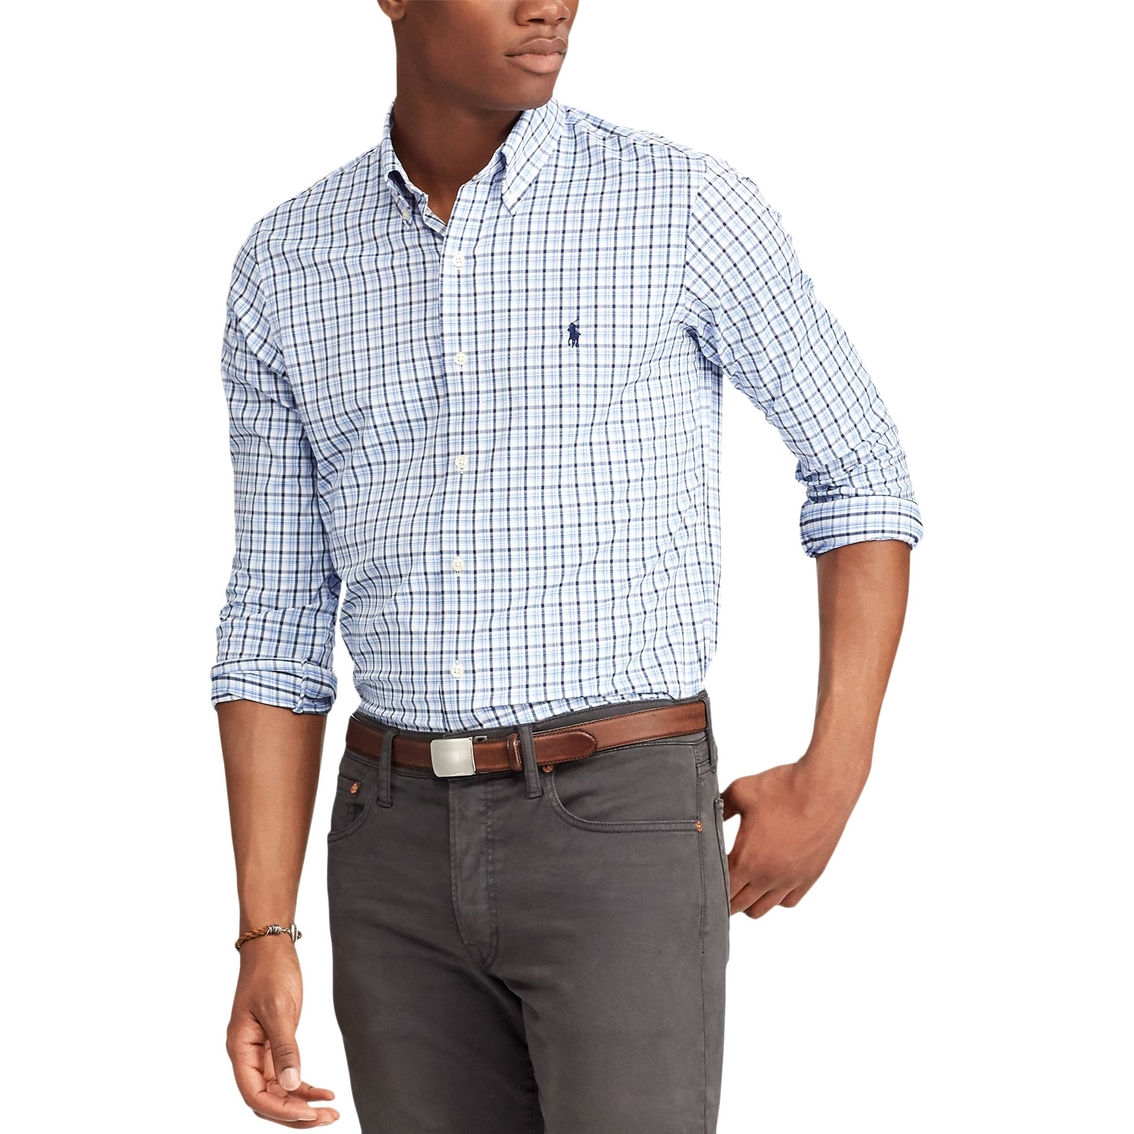 500d802f0 Polo Ralph Lauren Classic Fit Plaid Performance Twill Shirt